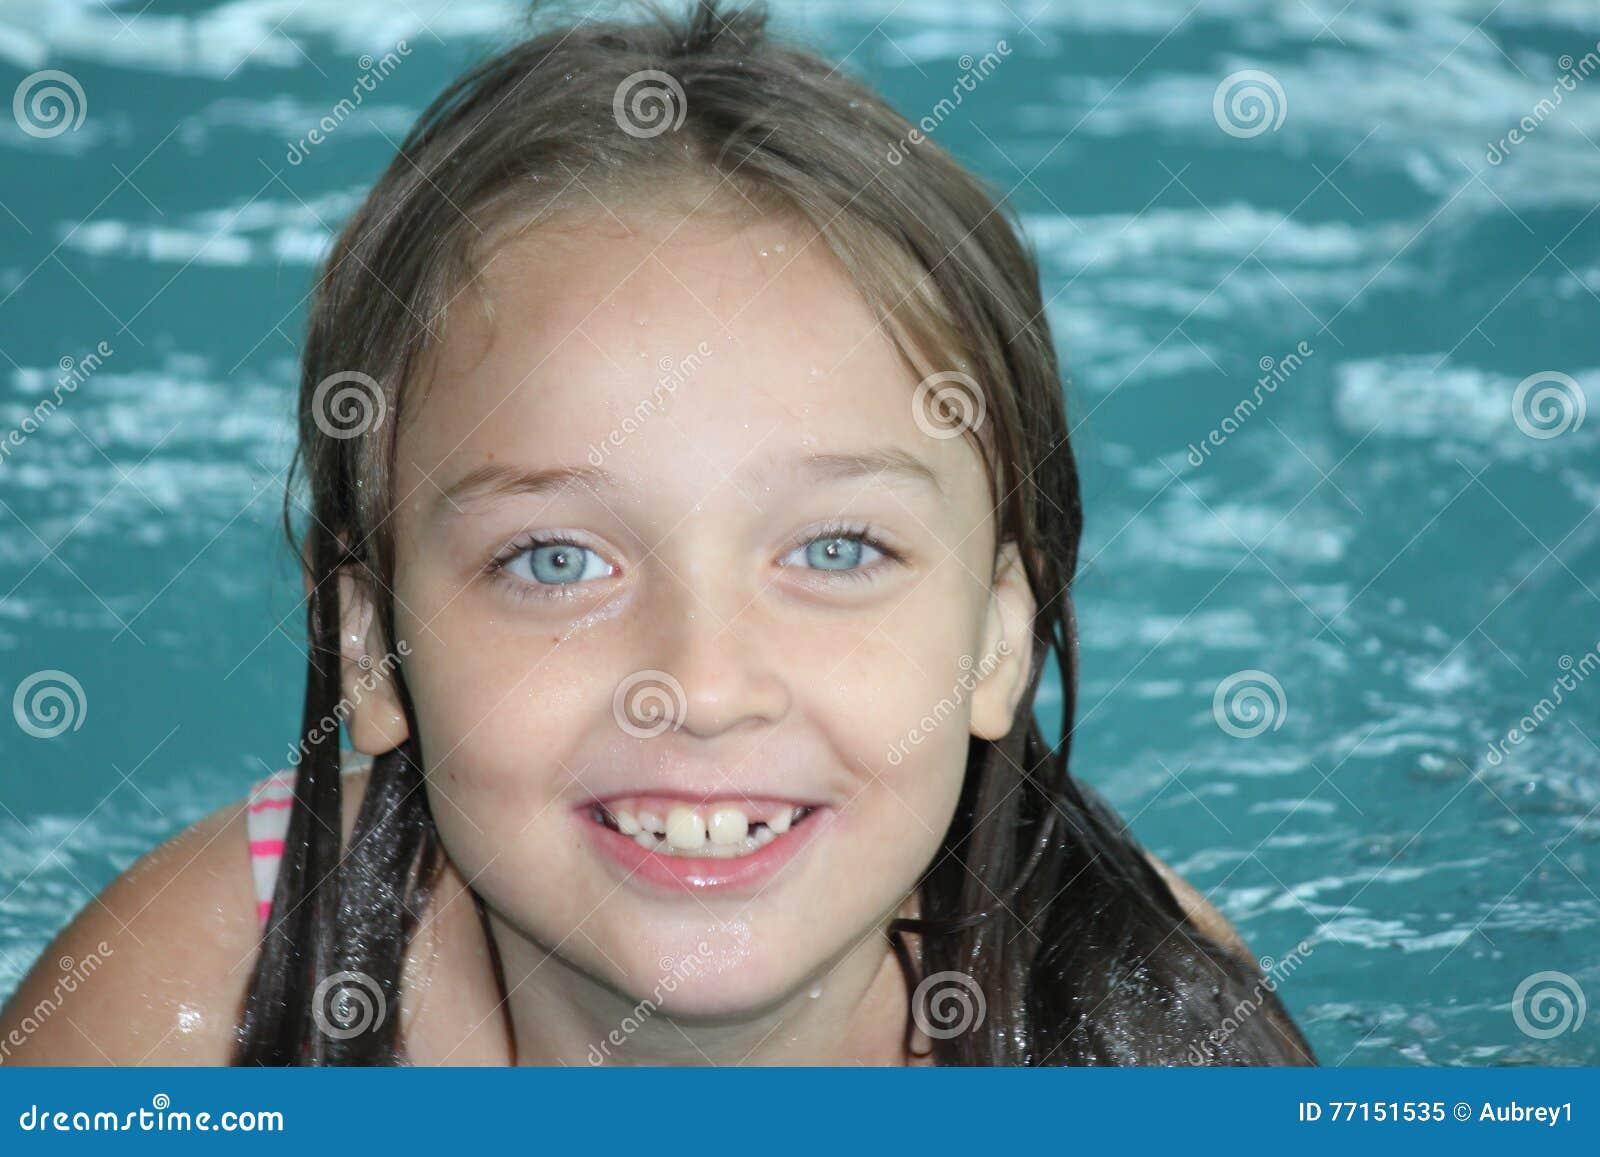 Fille Enfant-dans la piscine